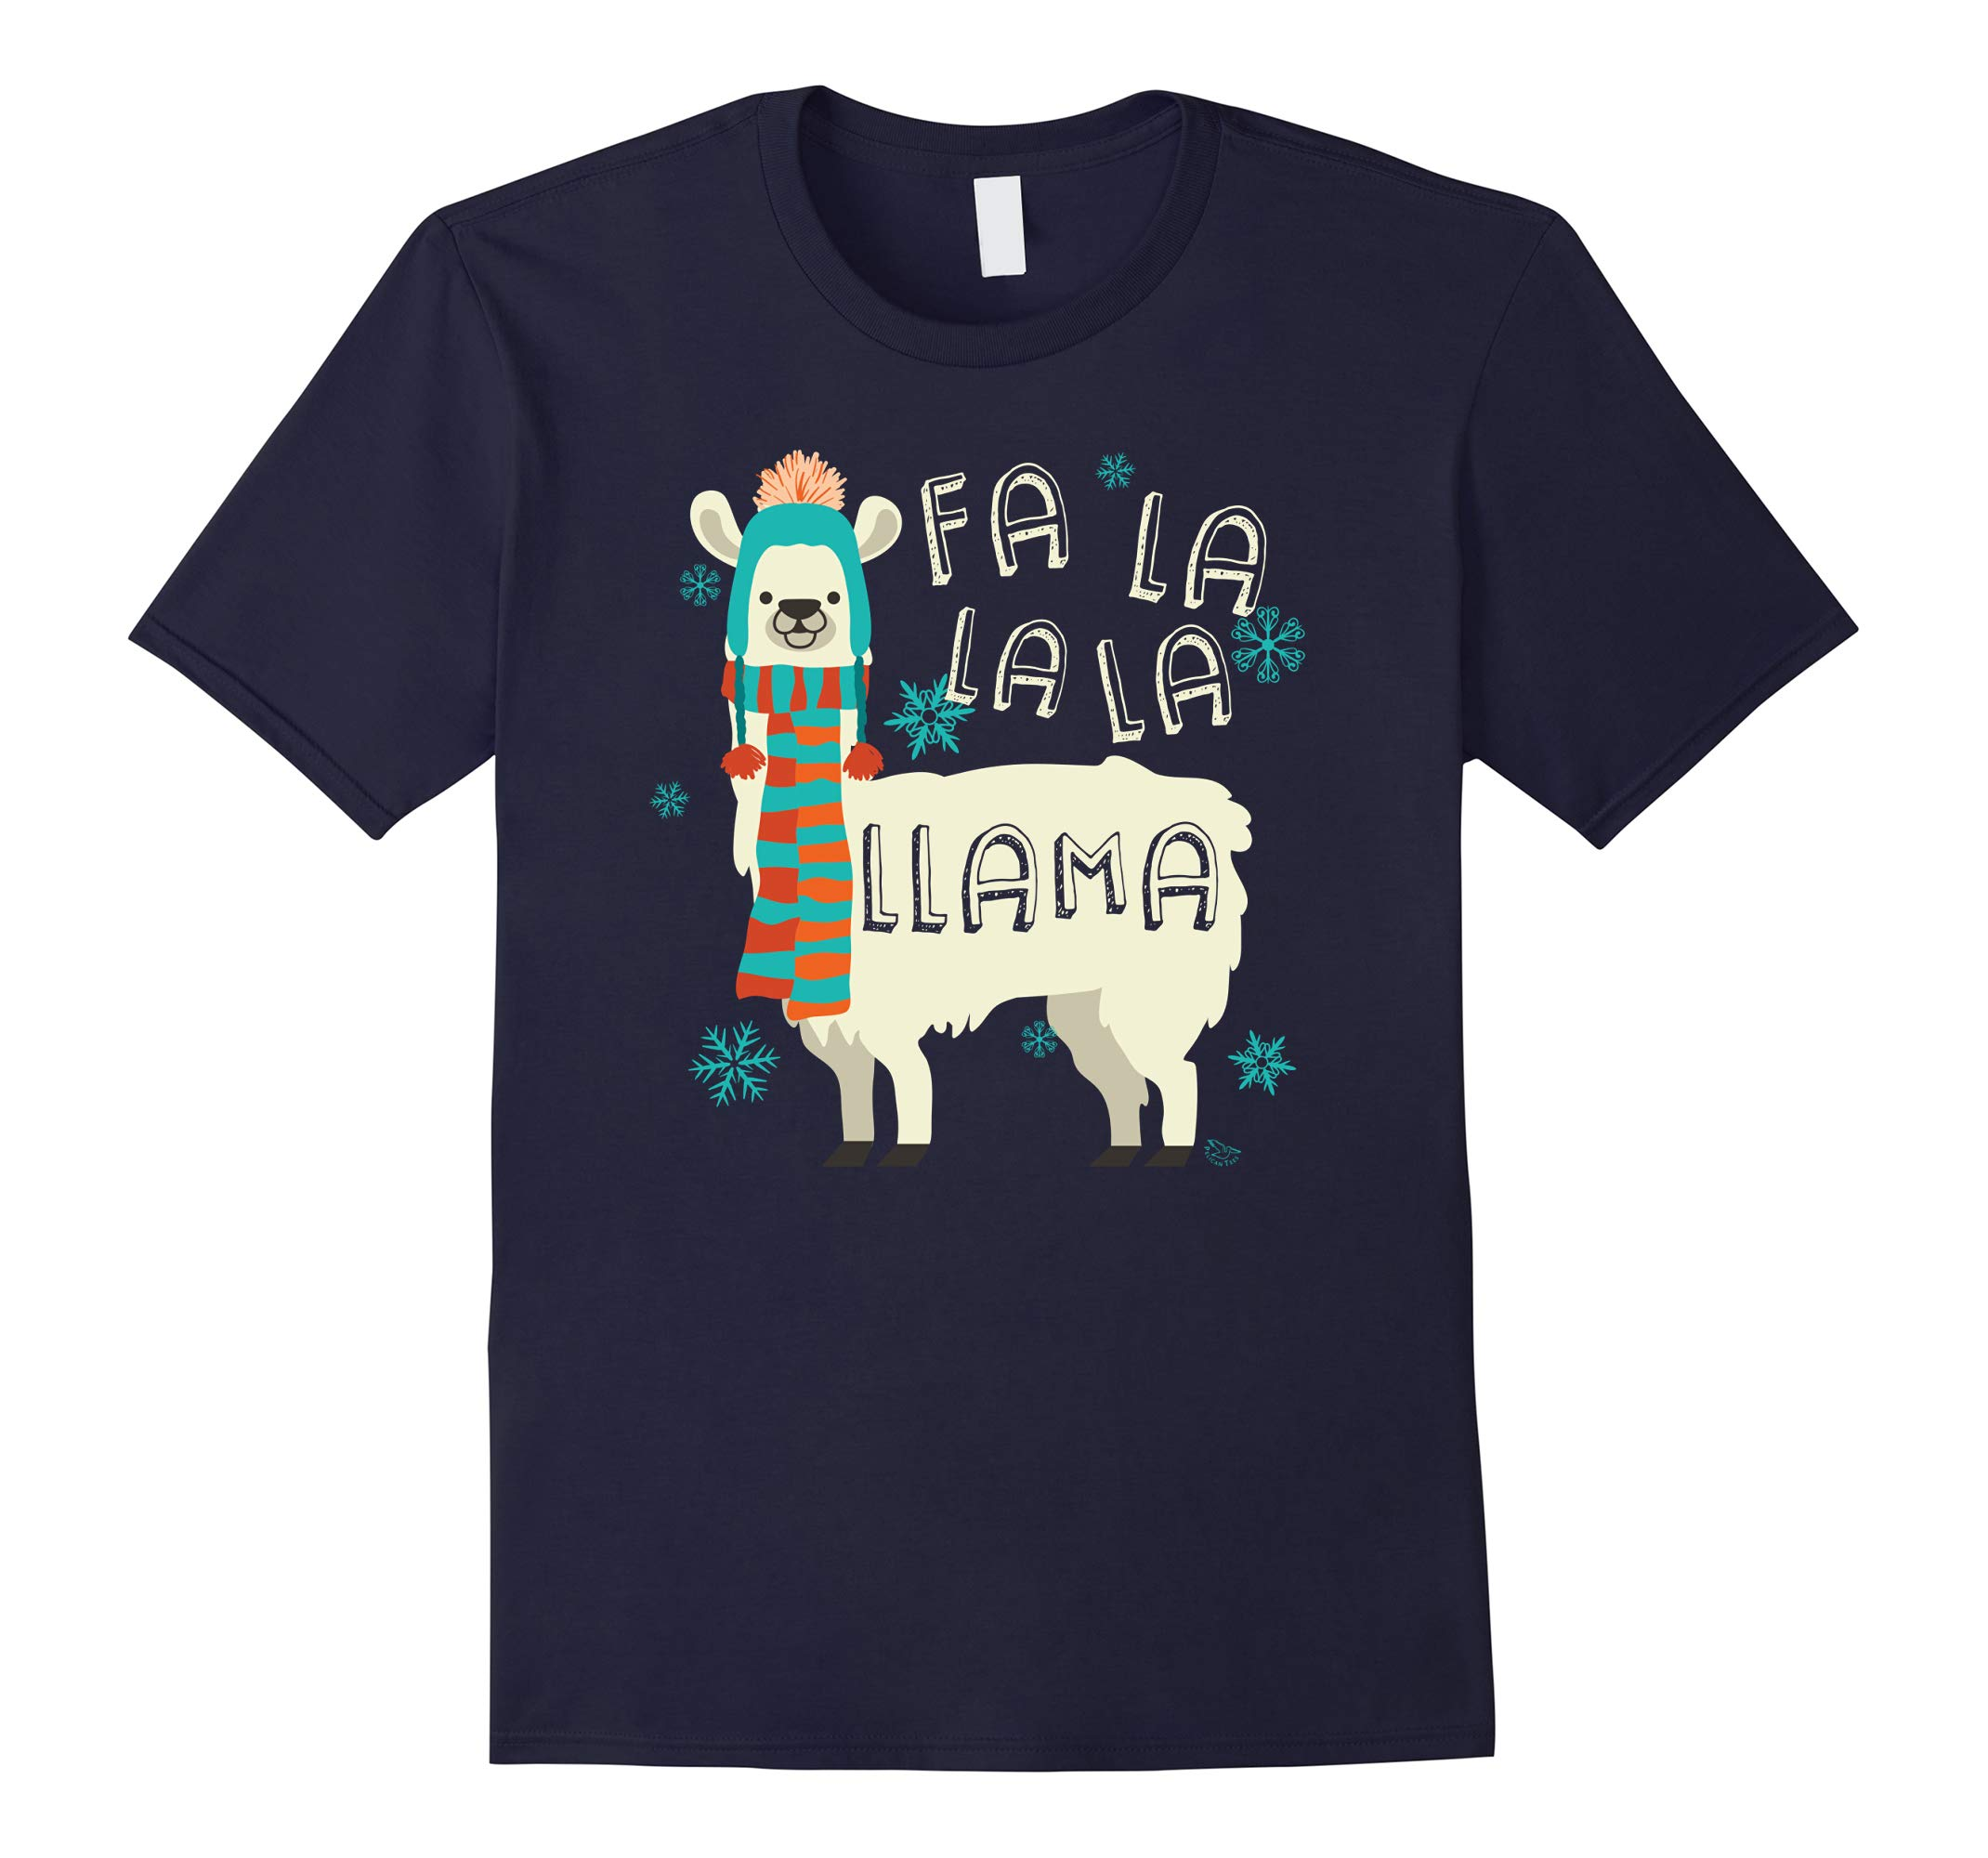 Fa La La La Llama T-Shirt | Cute Llama Christmas Shirt-RT